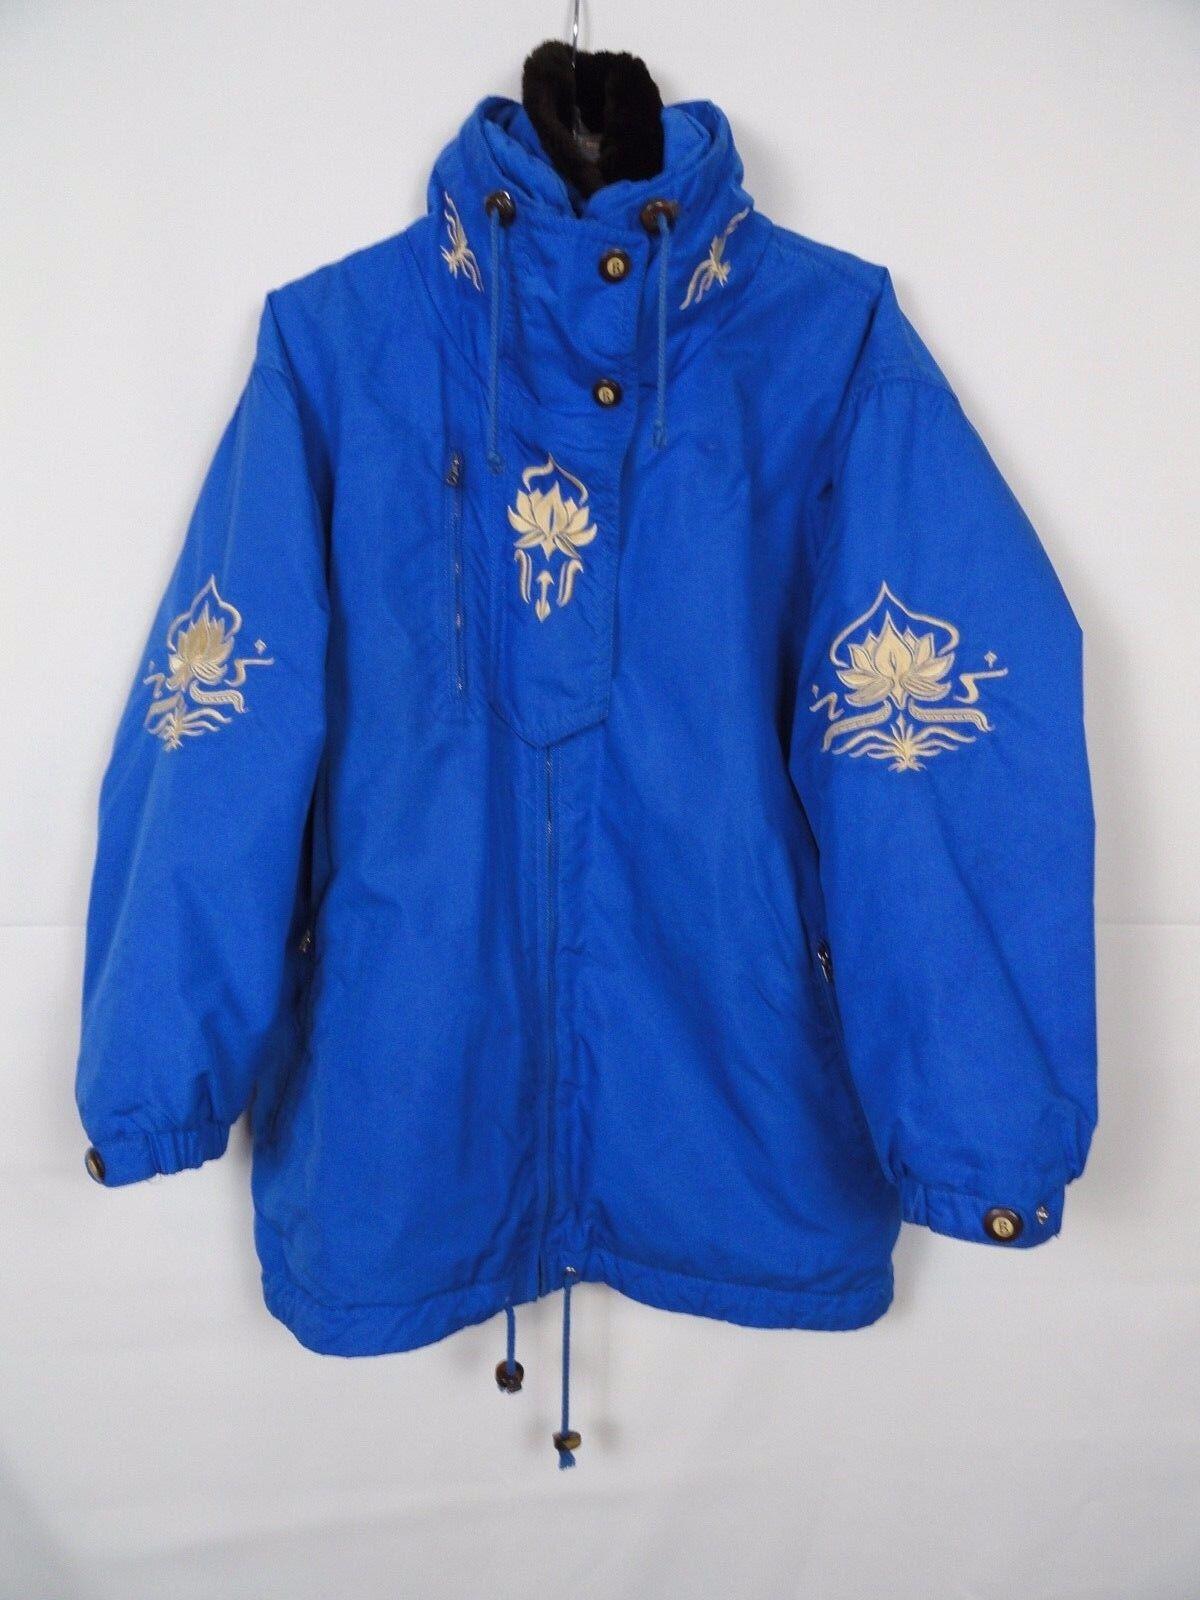 Купить Bogner - RARE Women's BOGNER BLUE Ski Jacket Removable FAUX FUR COLLAR Sz 12 Made in USA